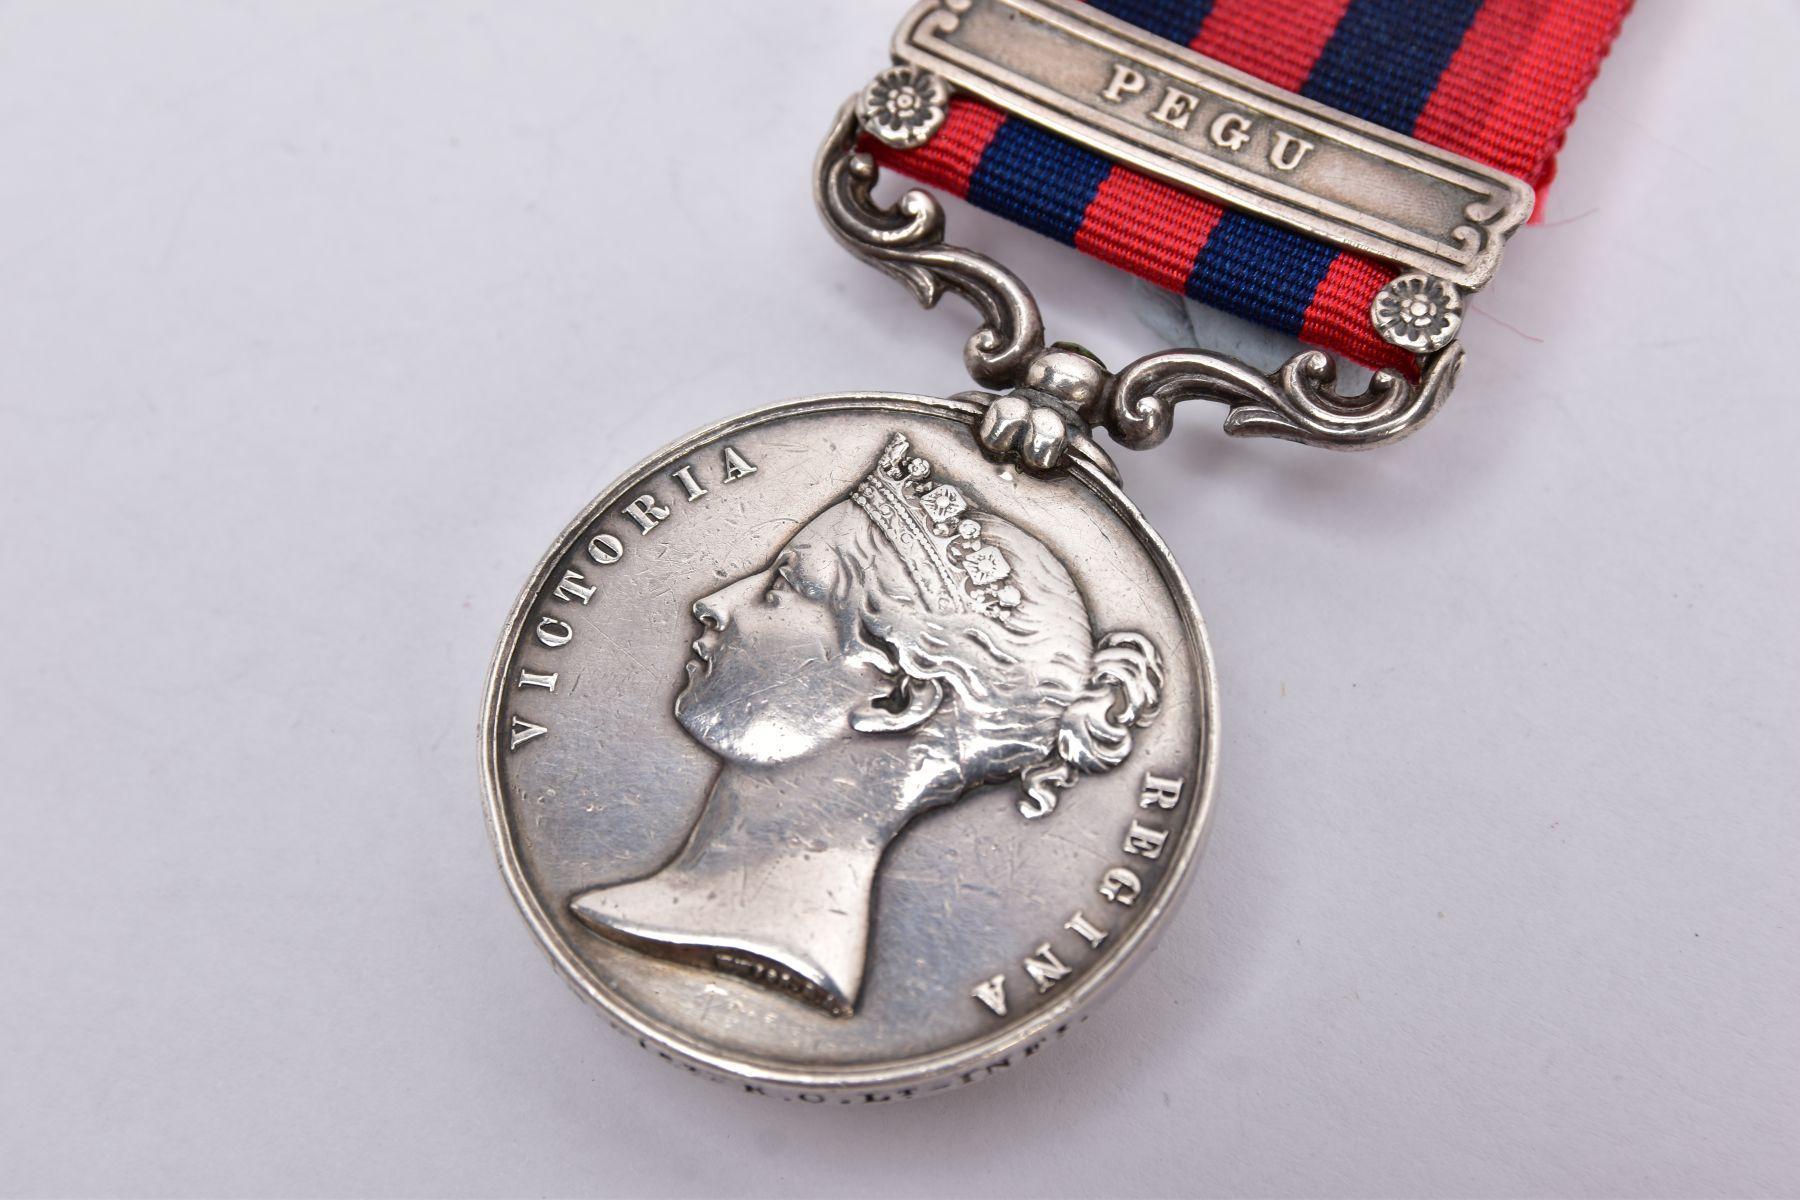 INDIA GENERAL SERVICE MEDAL 1854, Bar Pegu, named on rim John Haniin 51st K.C.Lt Infantry - Image 2 of 8